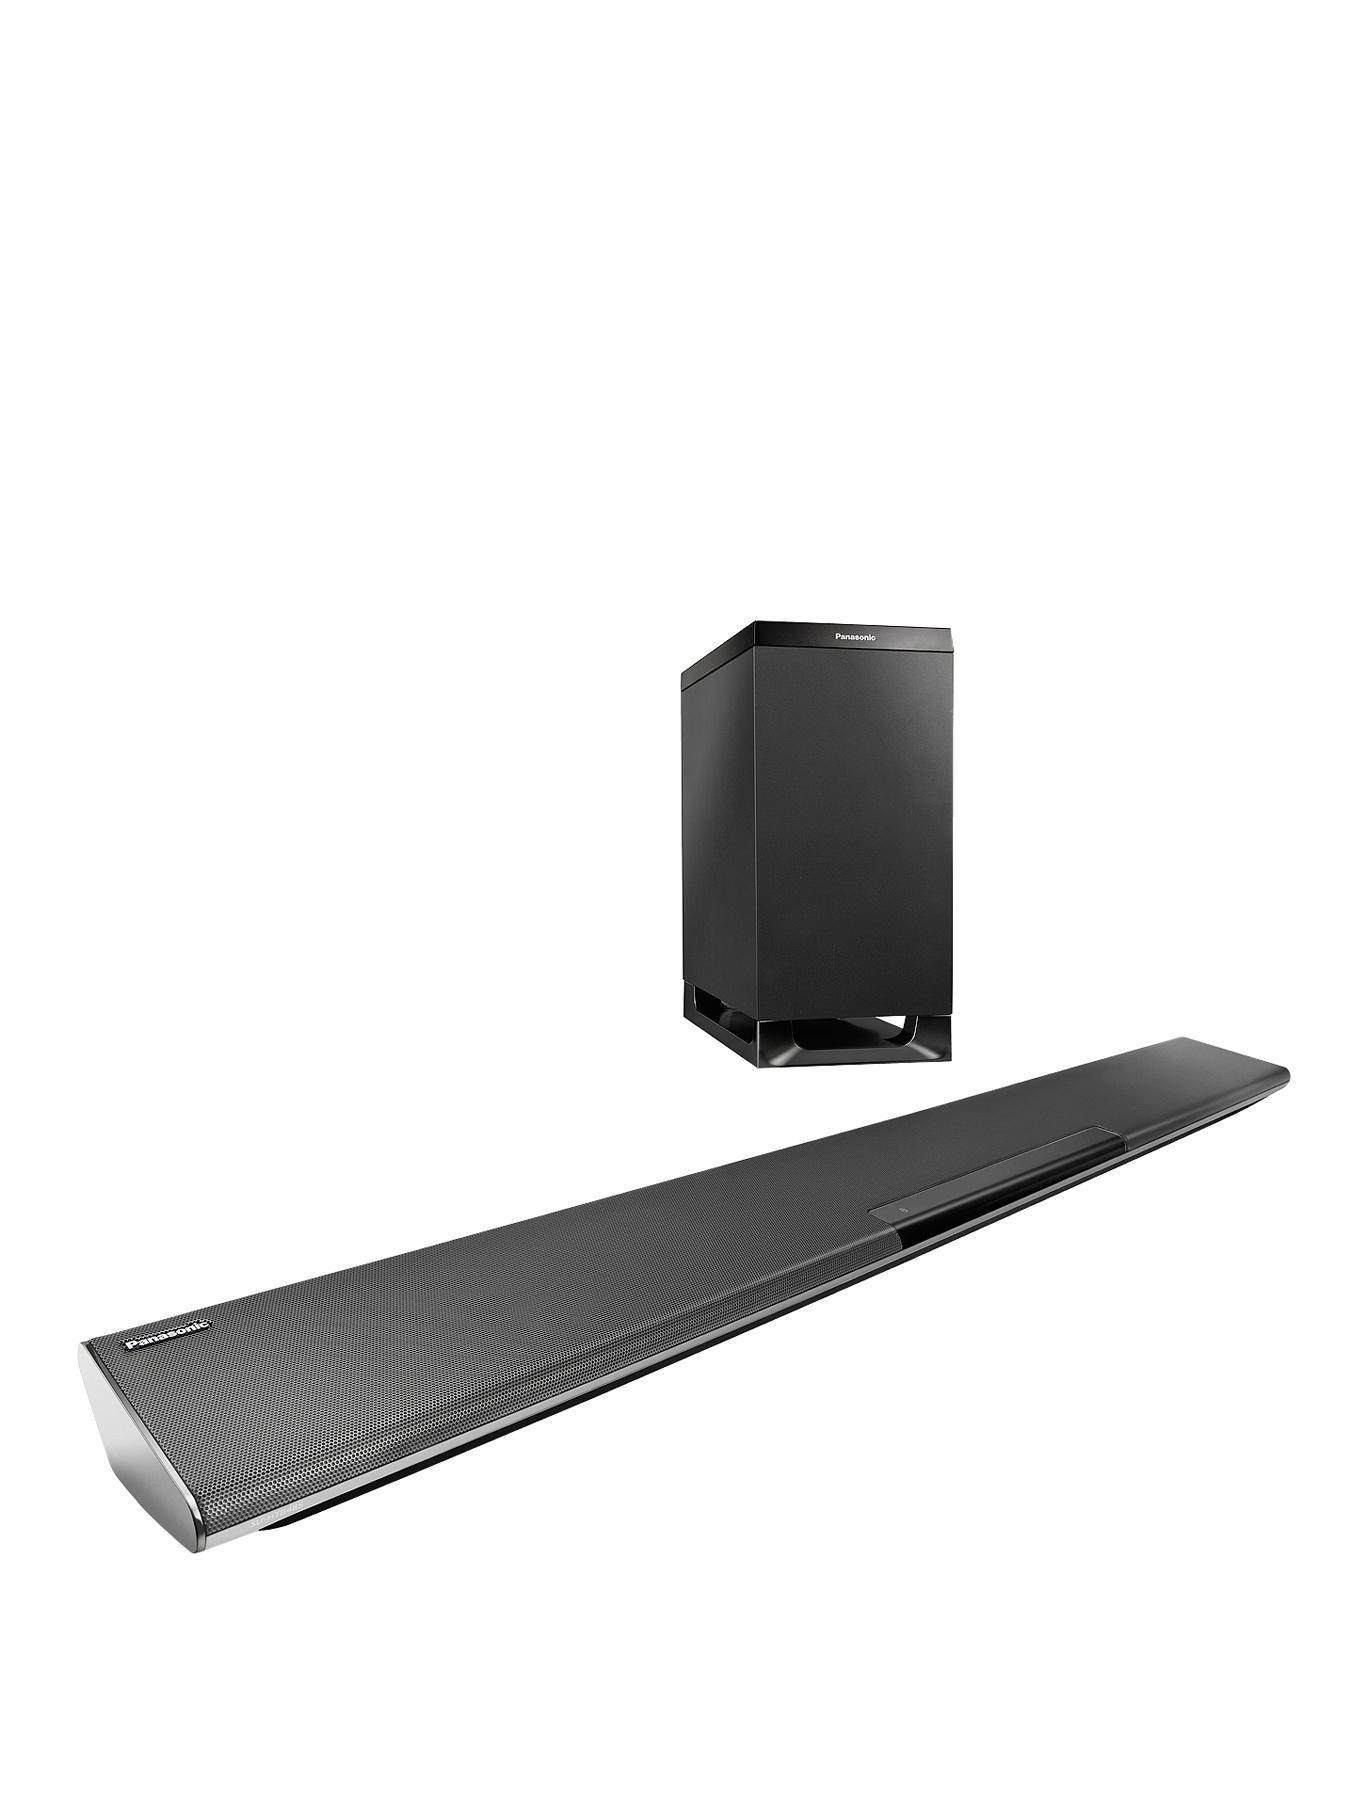 Panasonic SC-HTB485 250W Bluetooth Soundbar With Wireless Subwoofer